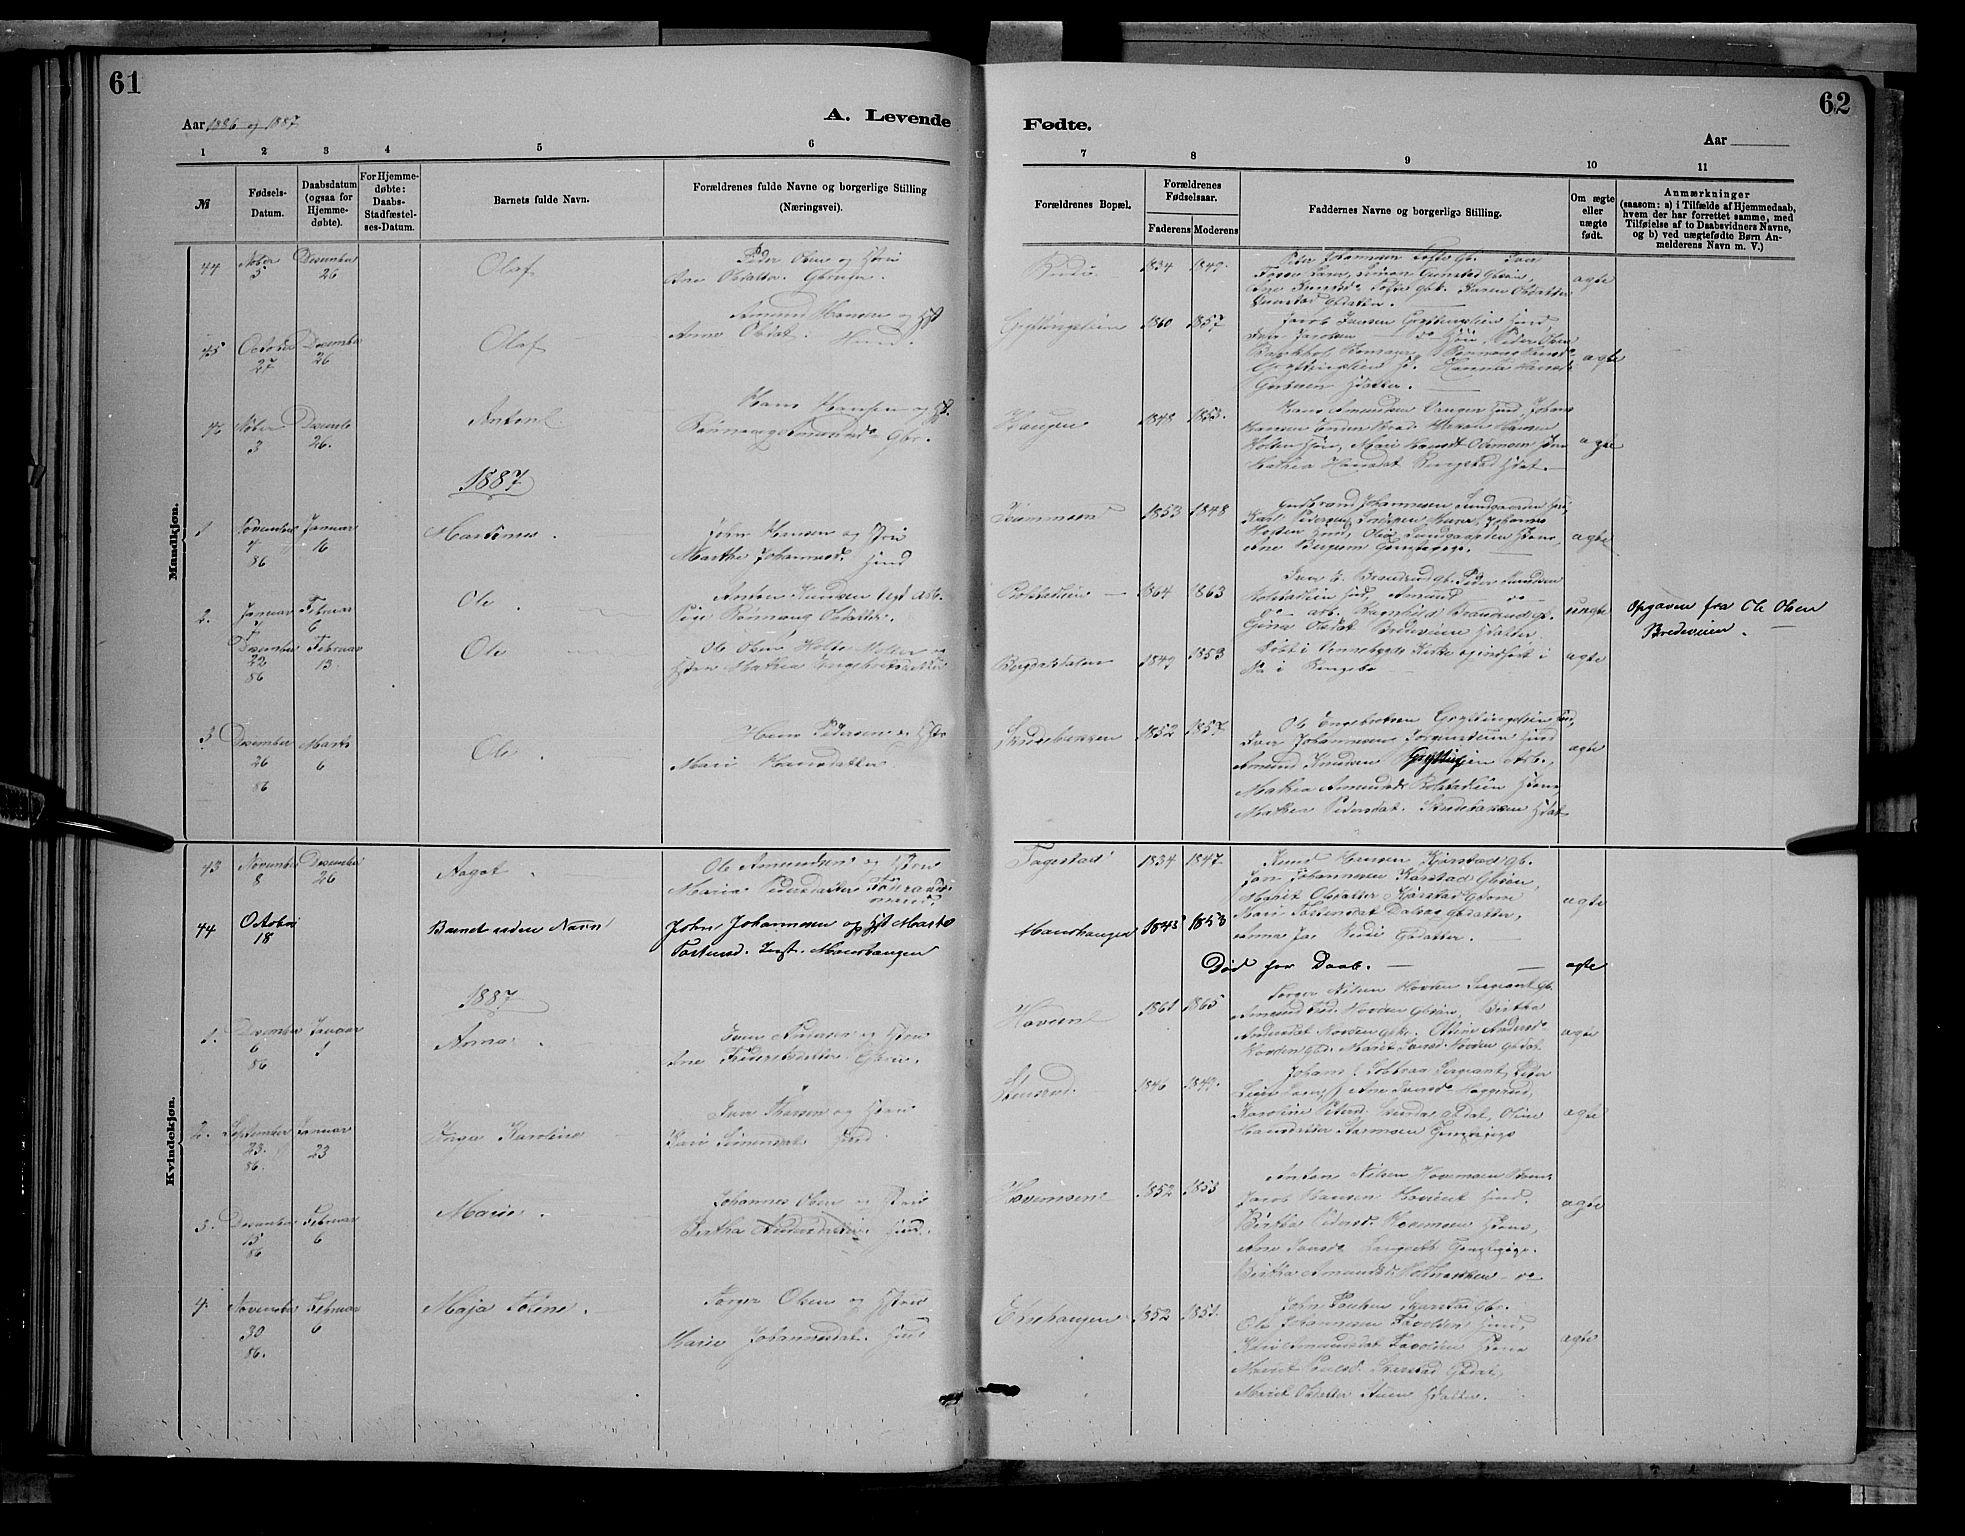 SAH, Sør-Fron prestekontor, H/Ha/Hab/L0003: Klokkerbok nr. 3, 1884-1896, s. 61-62